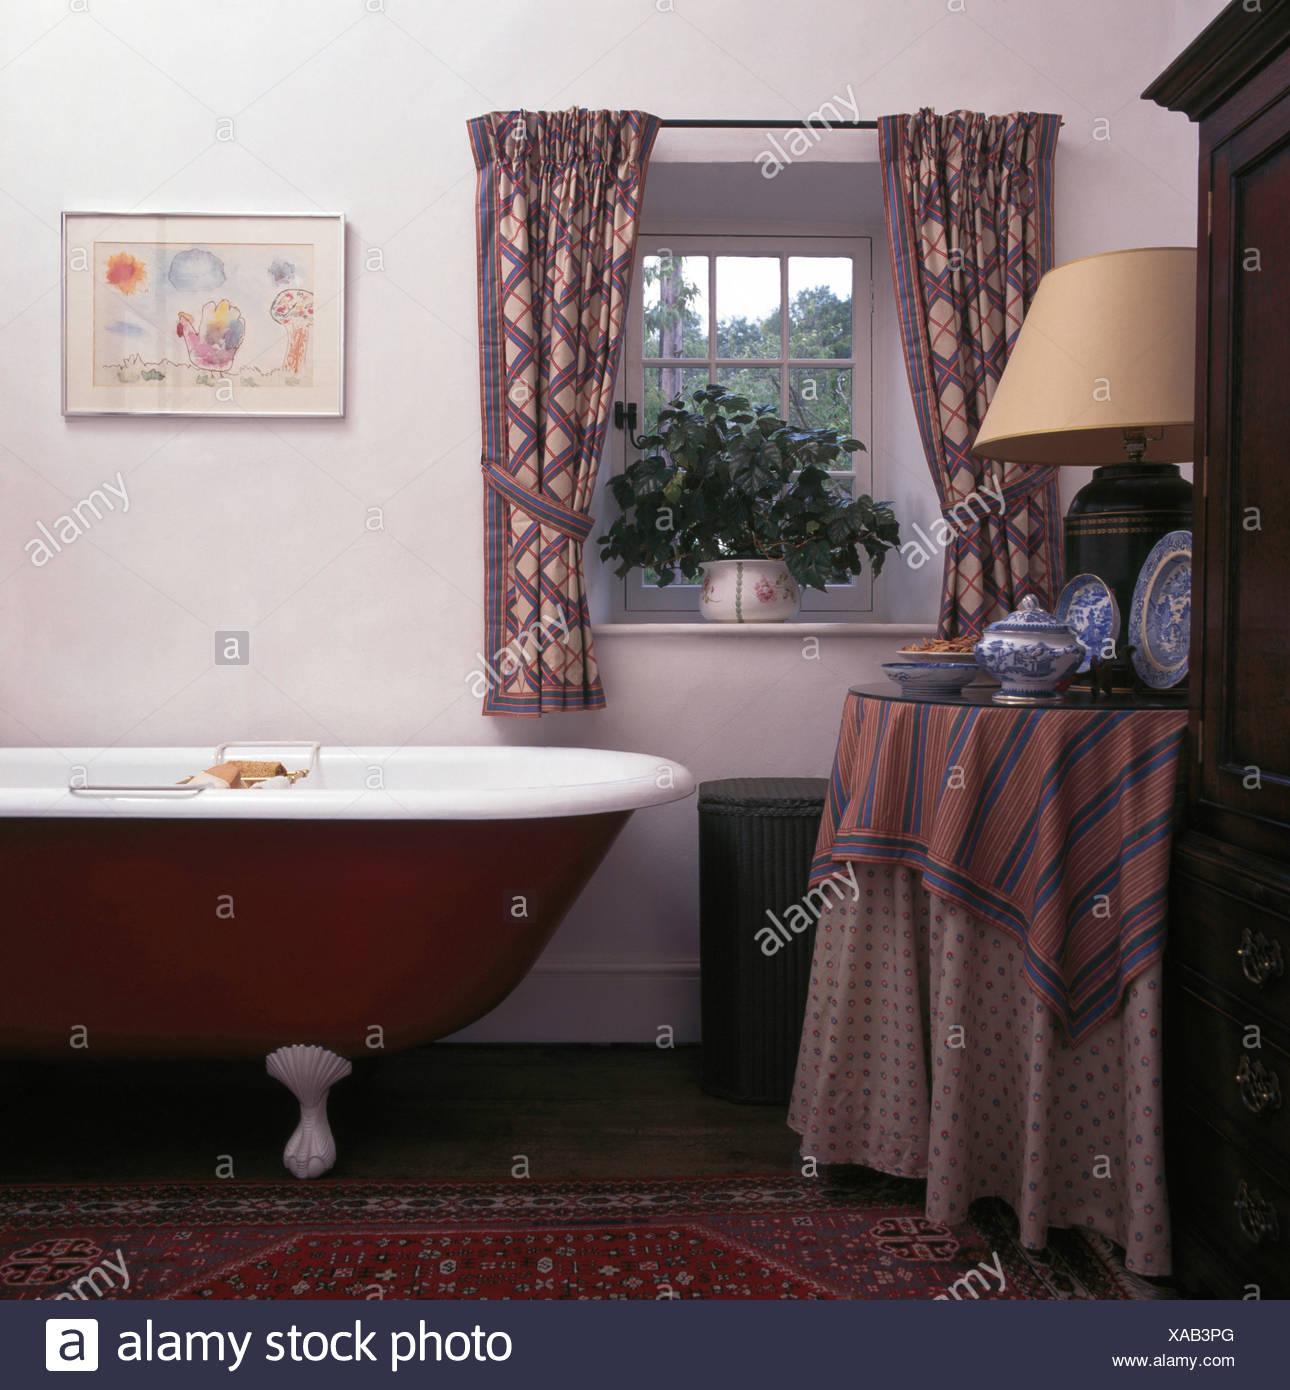 petite fenetre salle de bain bright